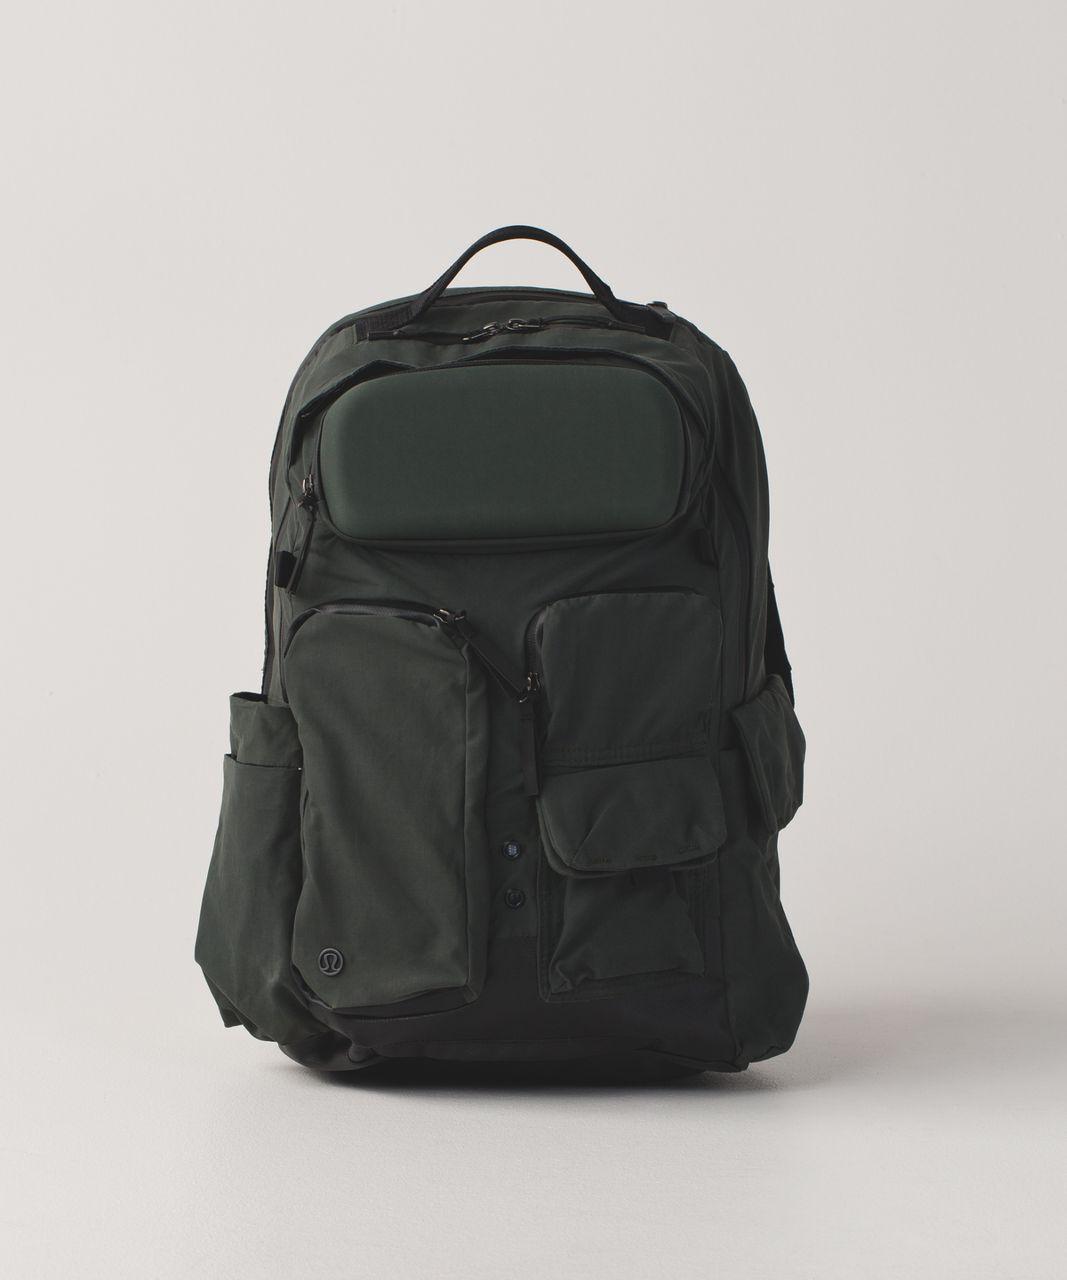 068734619a Lululemon Cruiser Backpack - Gator Green / Black - lulu fanatics